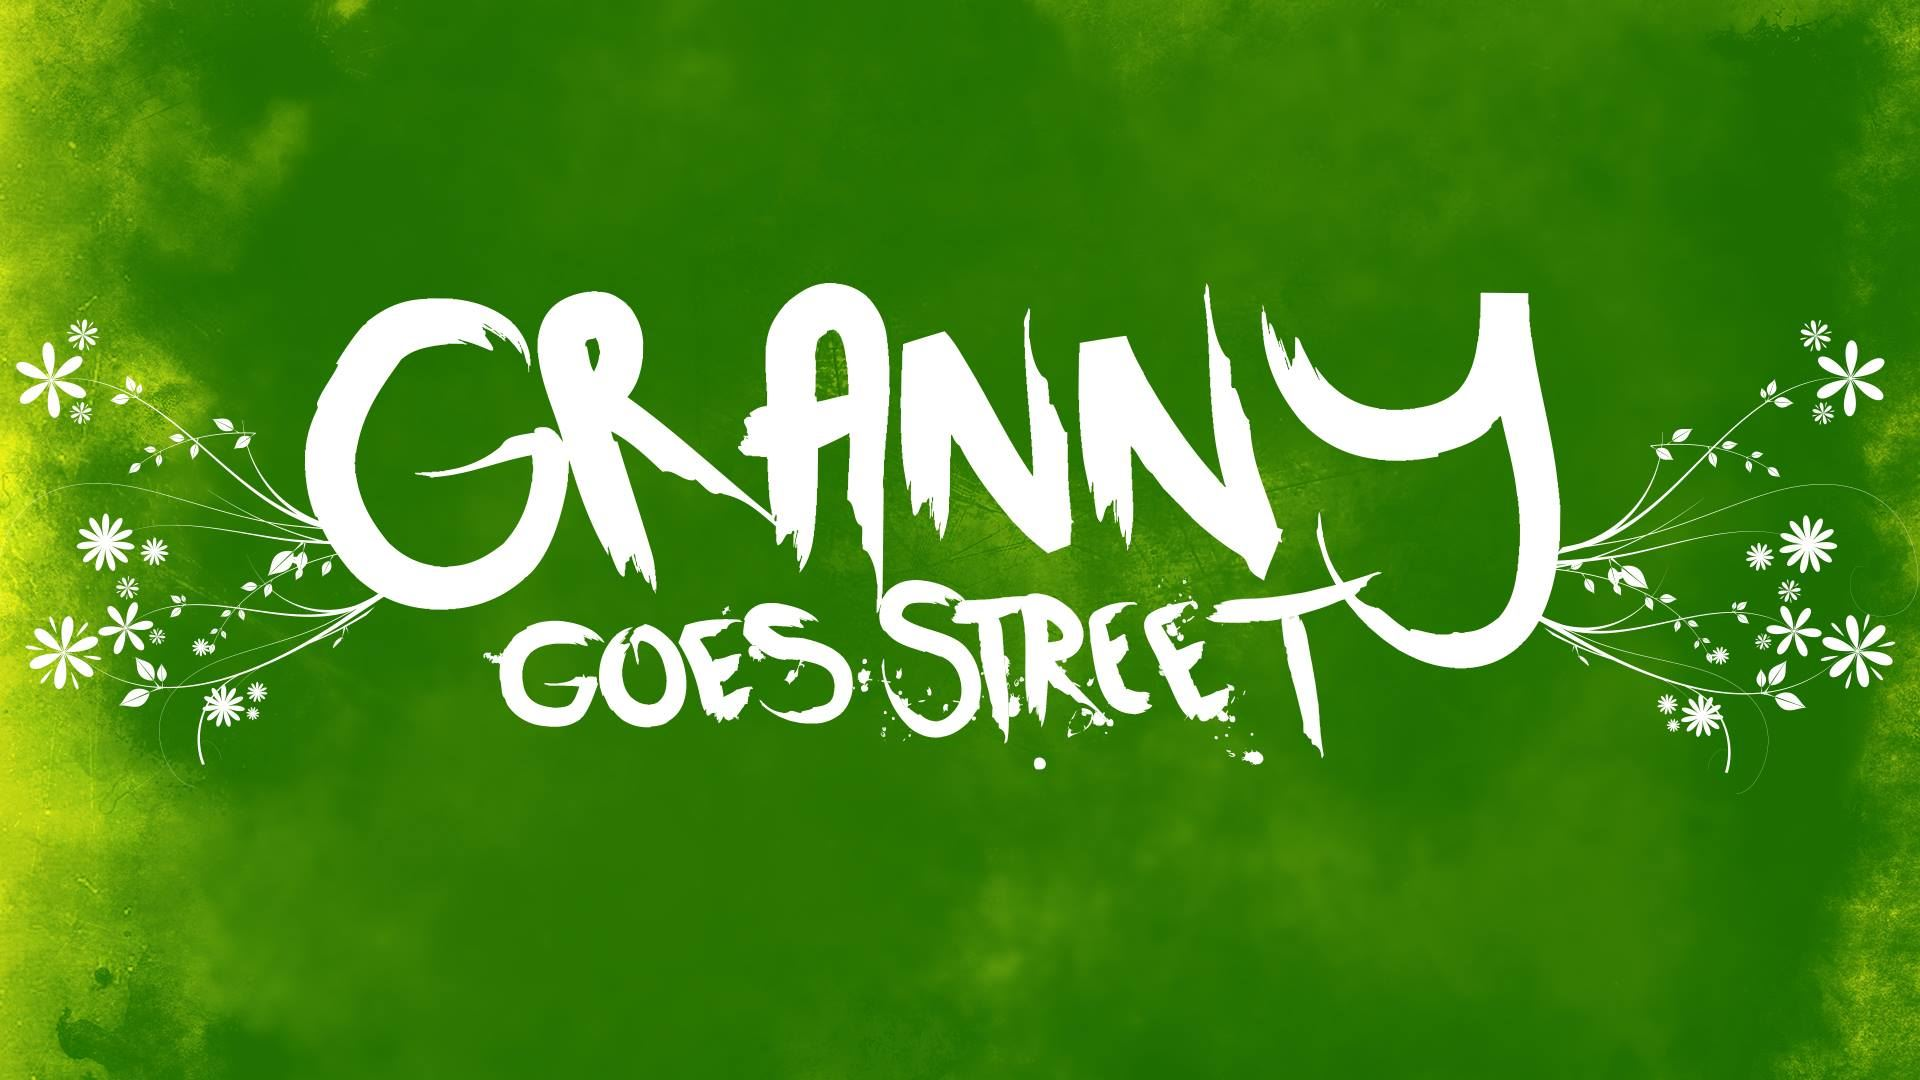 Granny Goes Street